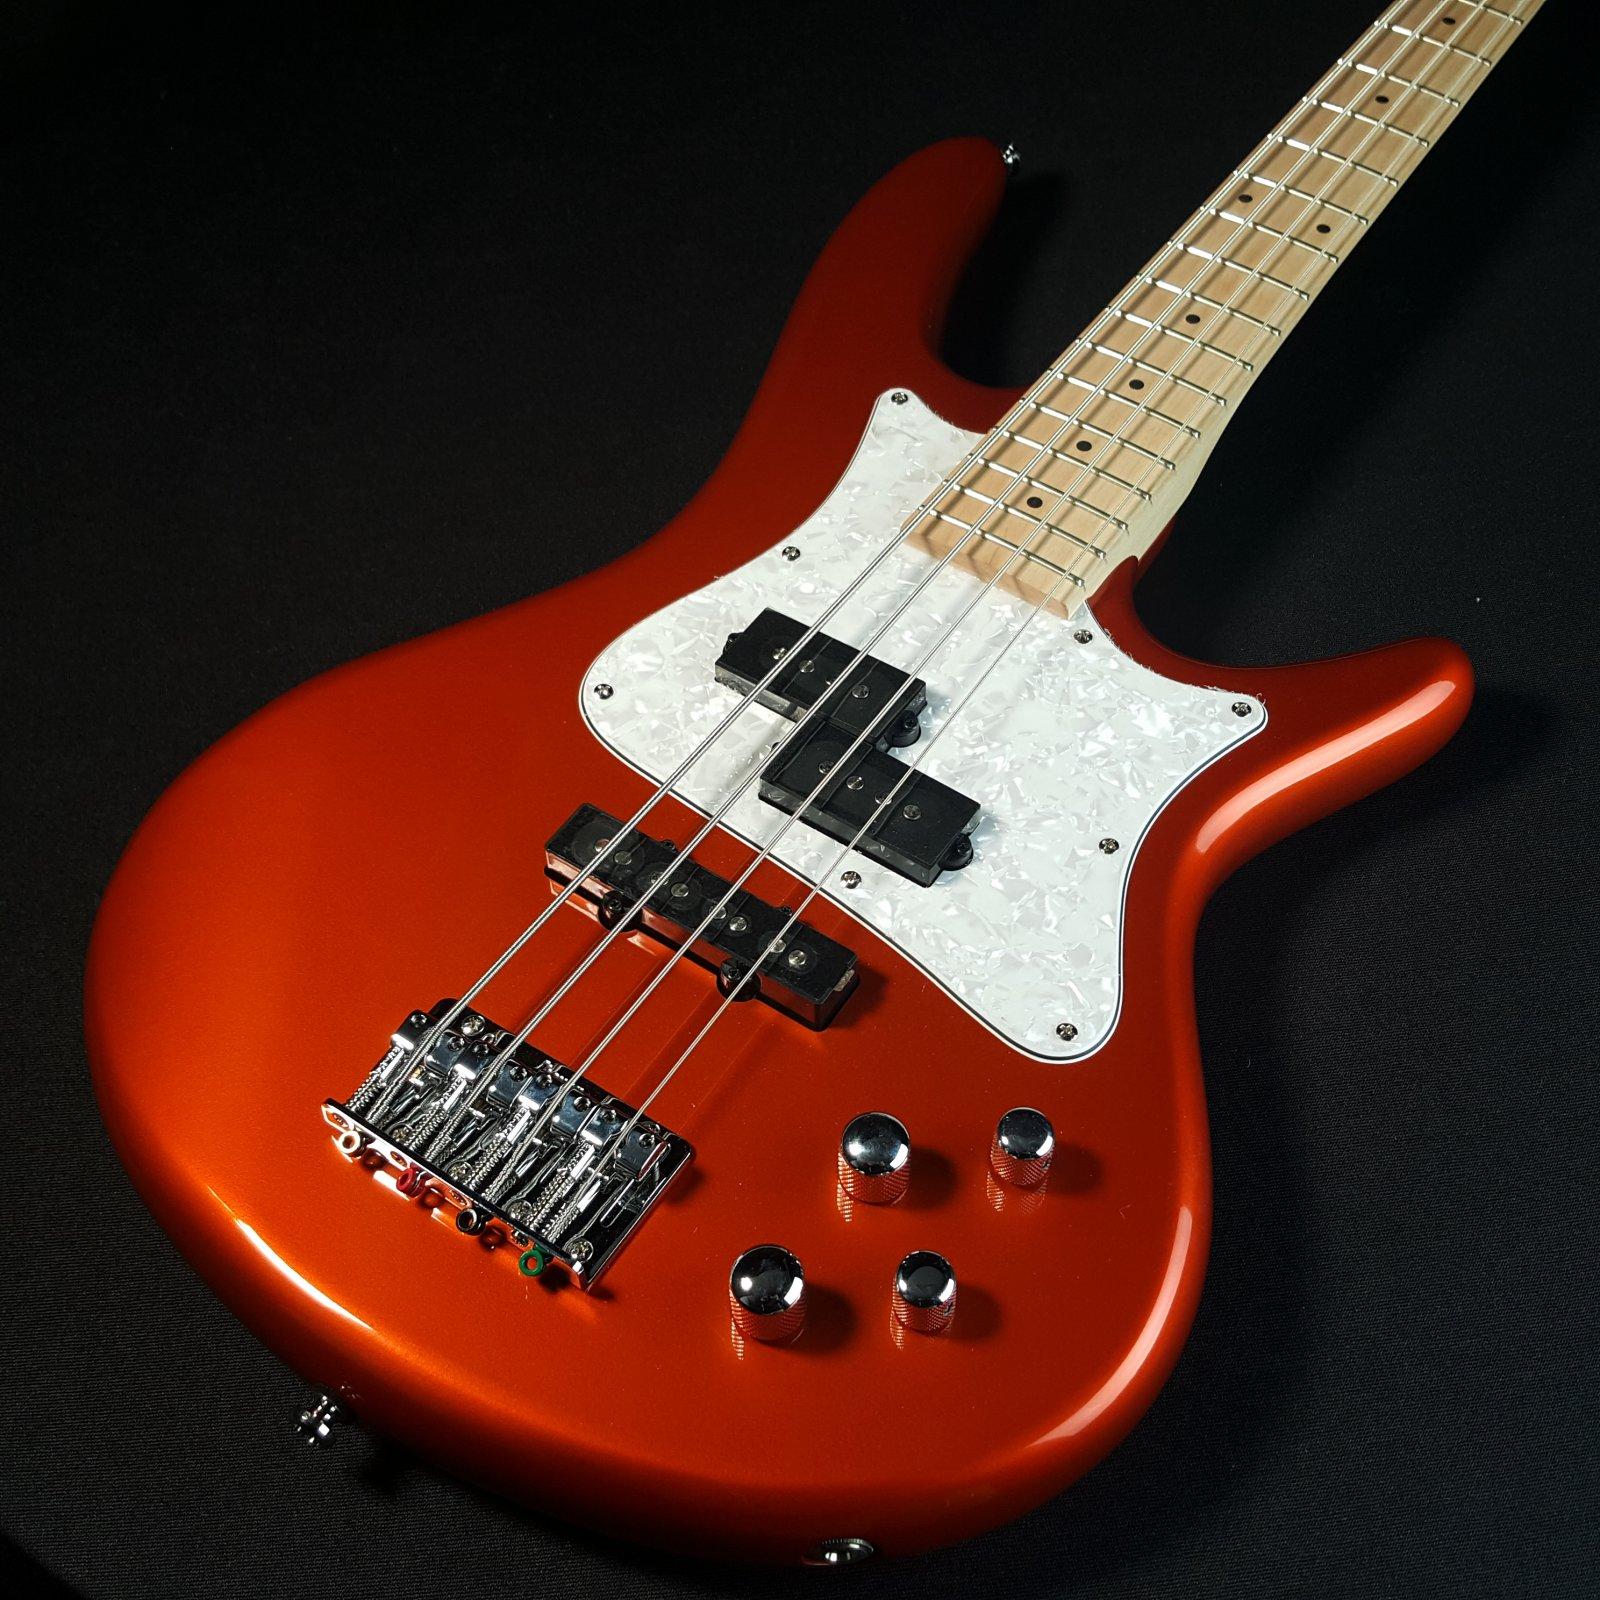 Ibanez Mezzo SRMD200 Medium Scale Bass- Roadster Orange Metallic